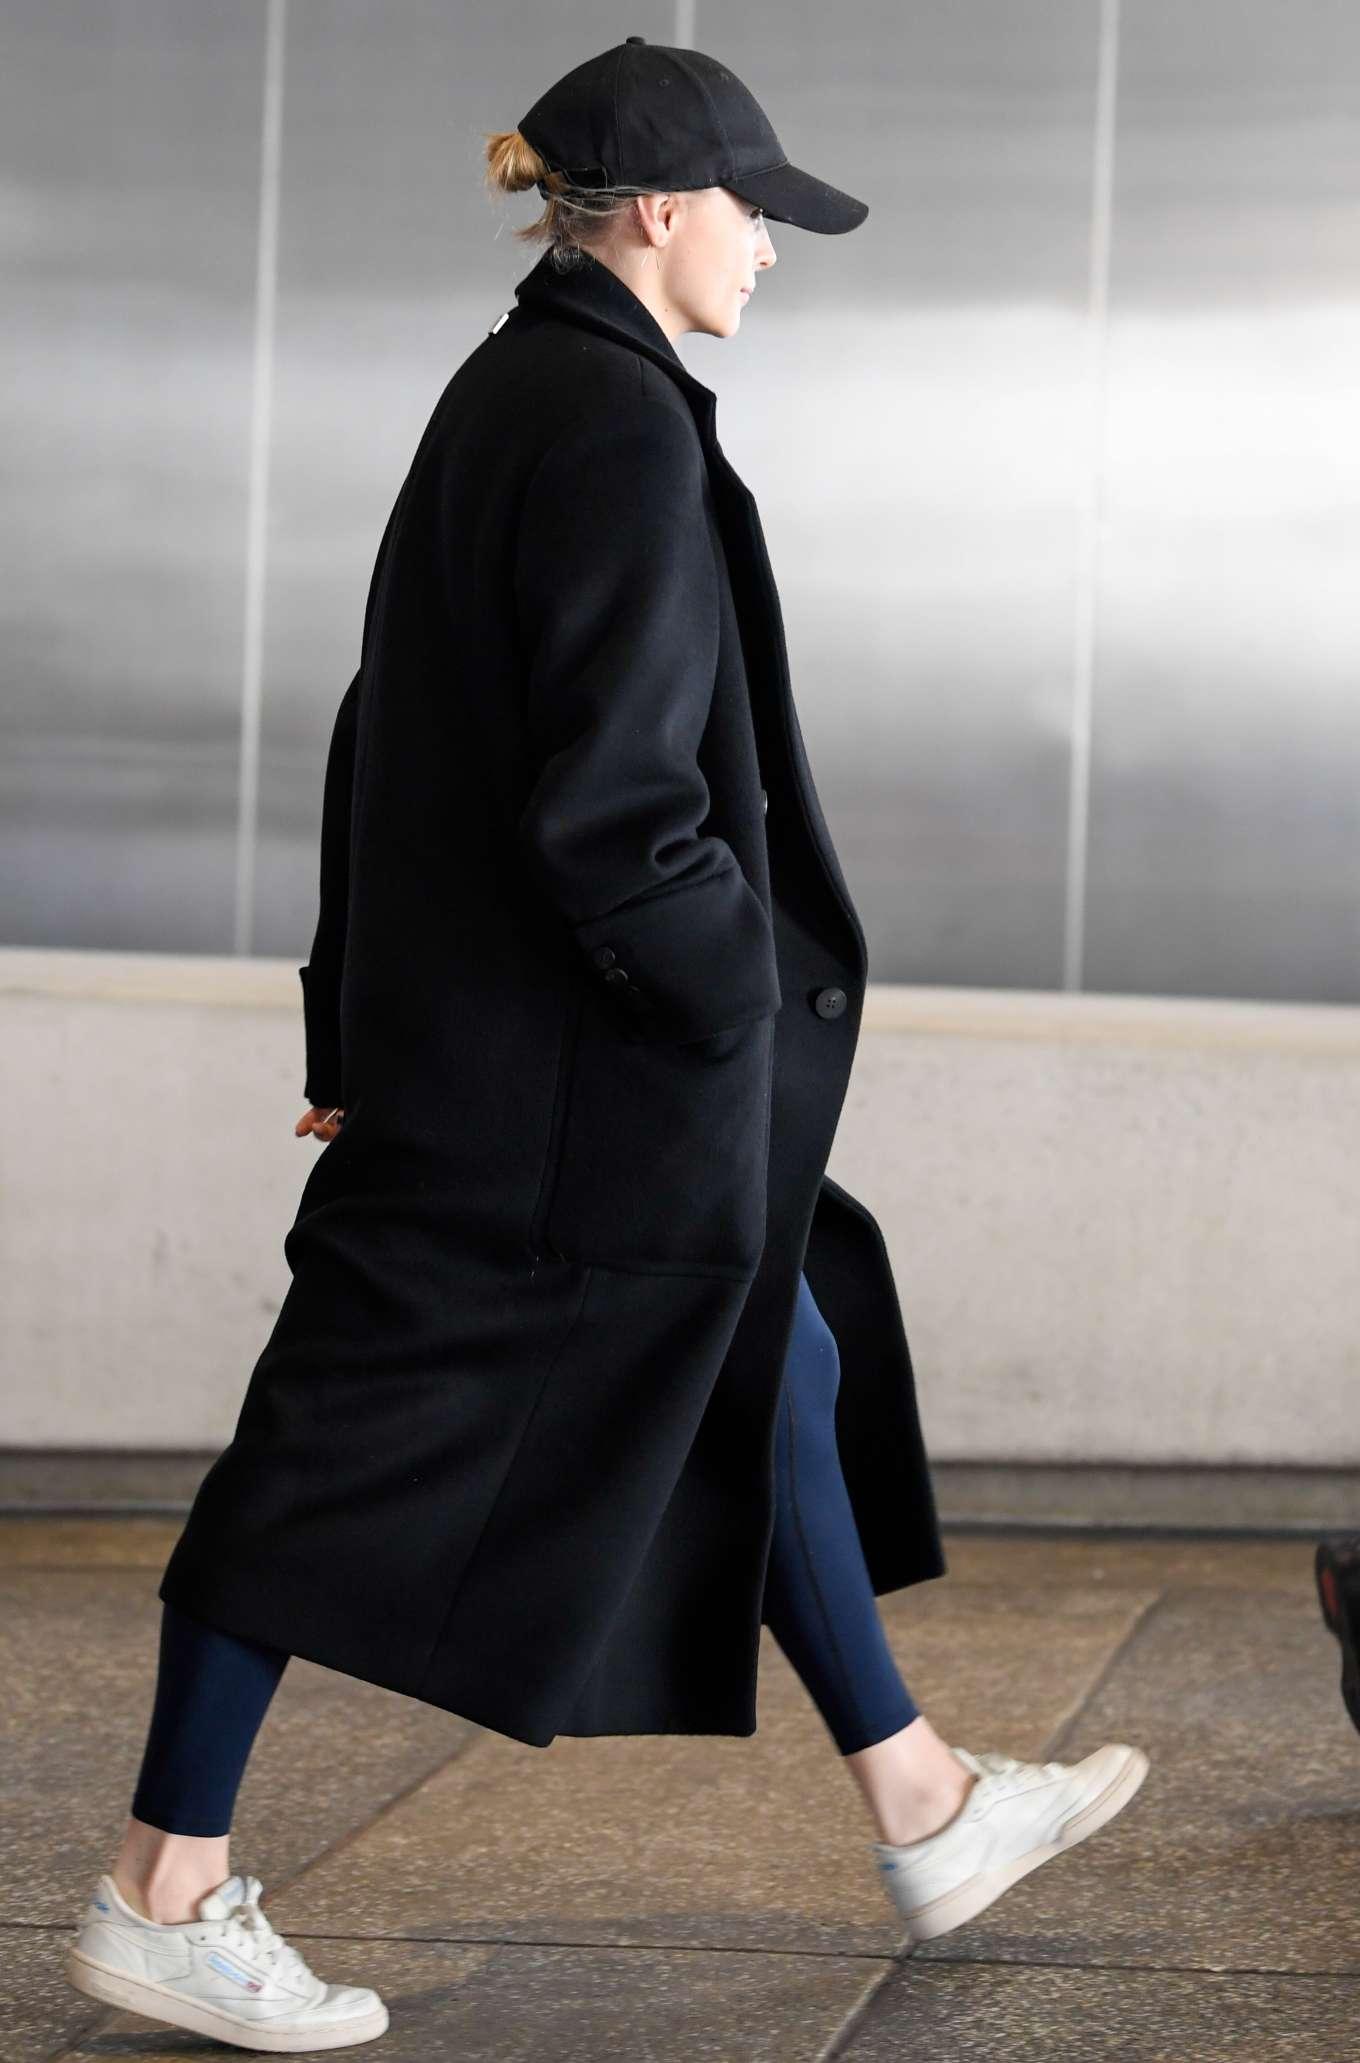 Chloe Grace Moretz 2019 : Chloe Grace Moretz – arriving to Los Angeles International Airport-01